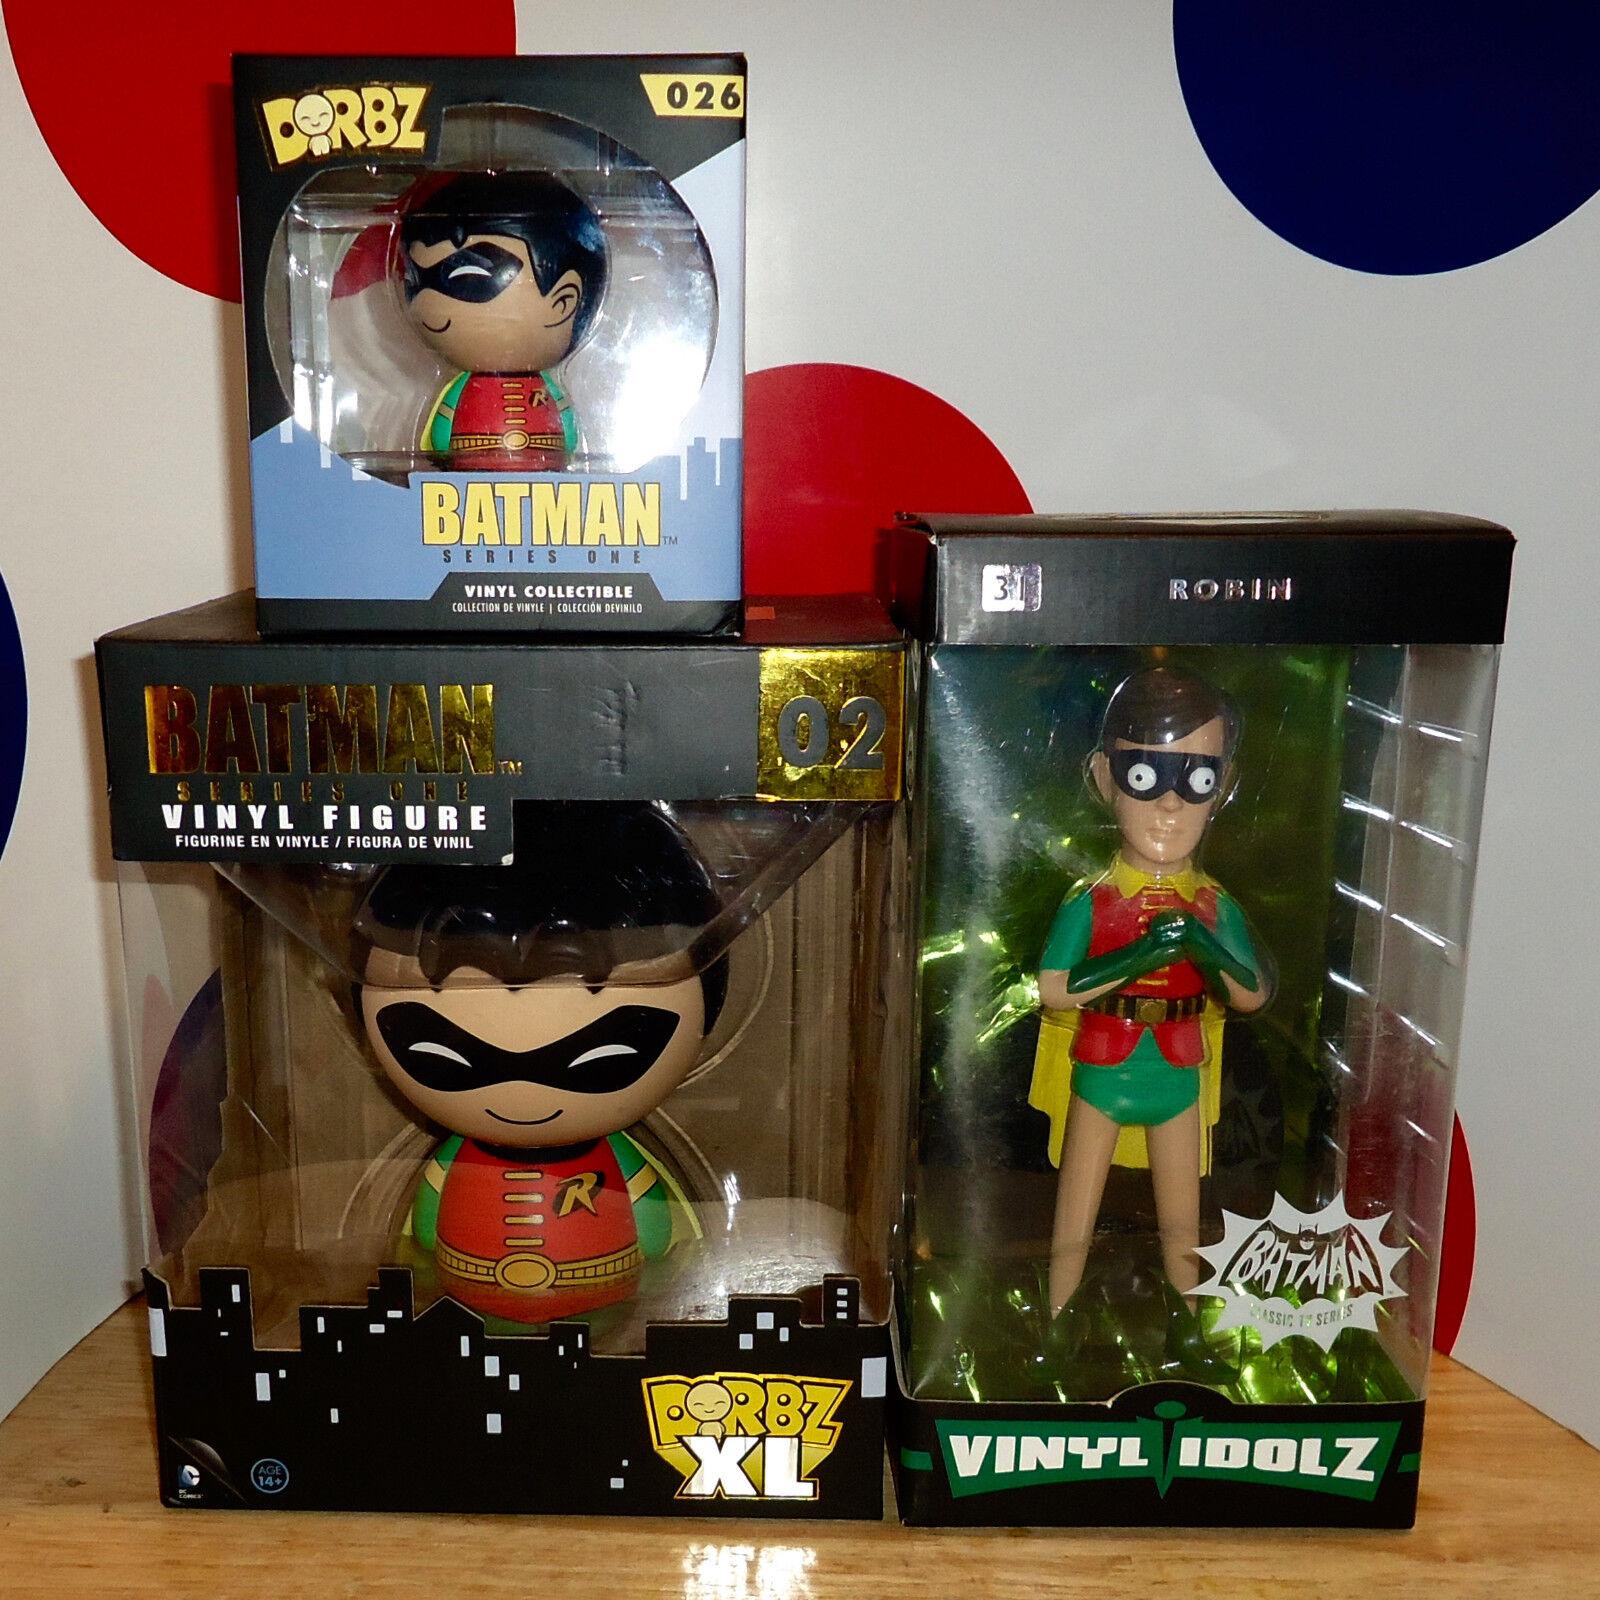 ROBIN THE BOY WONDER 3 VINYL FIGURE/IDOLZ VINYL SUGAR/WB Series 1 BATMAN DORBZ